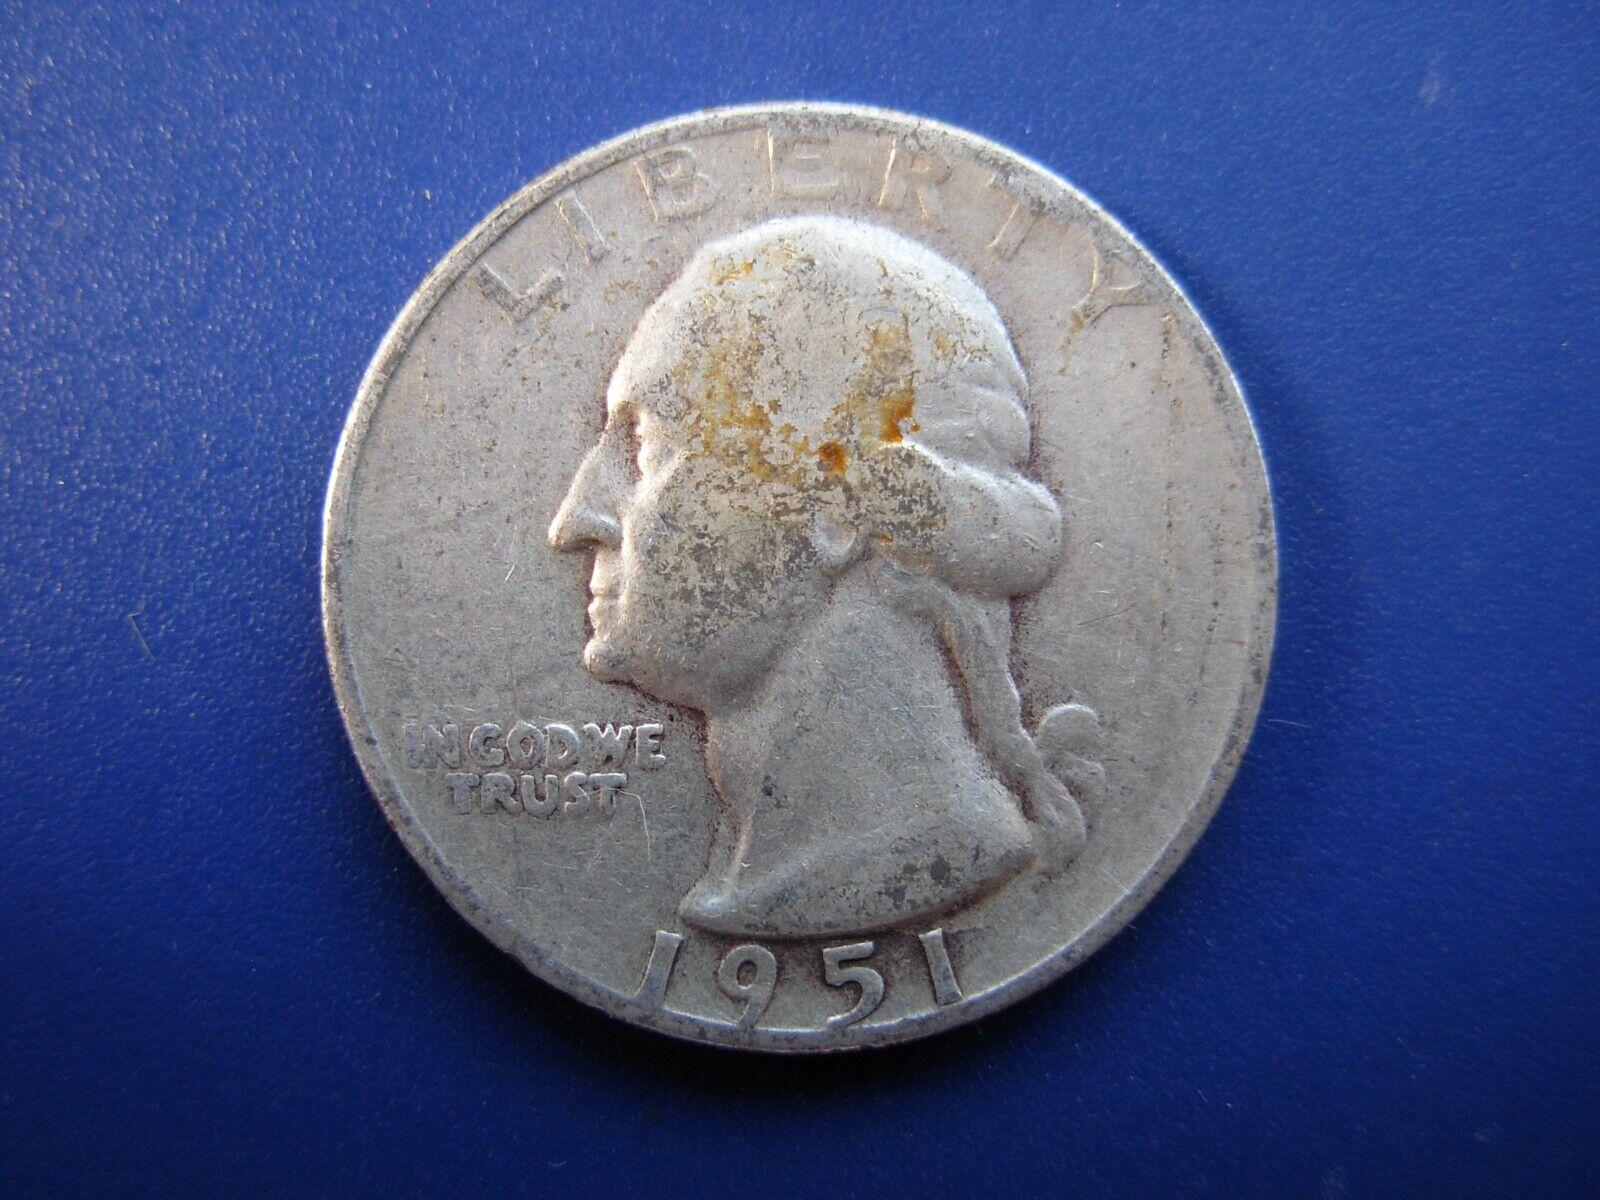 Very Nice Original 1951-S Washington Quarter. 1 - $7.25